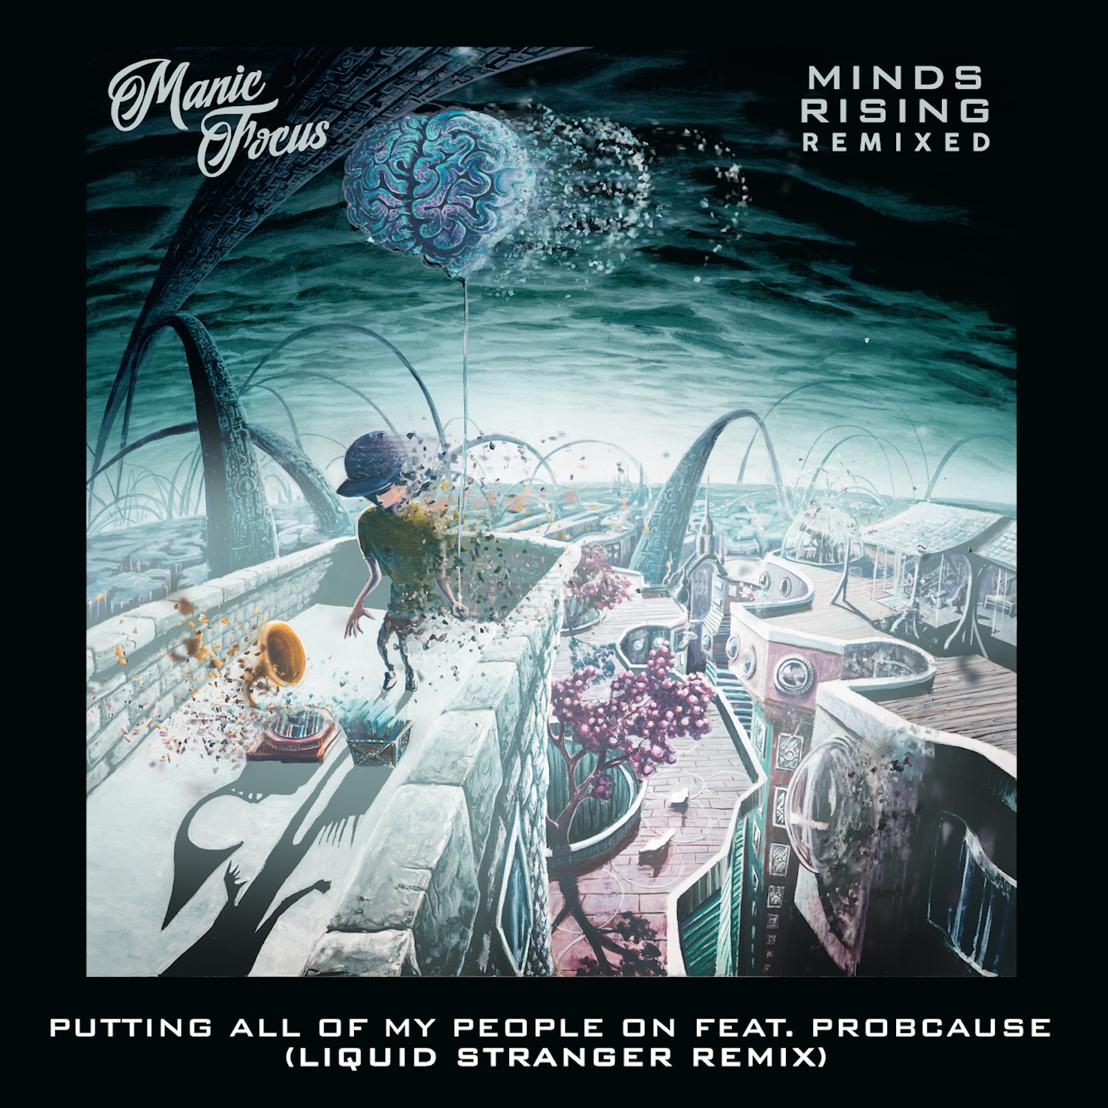 Manic Focus Announces Minds Rising Remixed Album With First Listen from Liquid Stranger